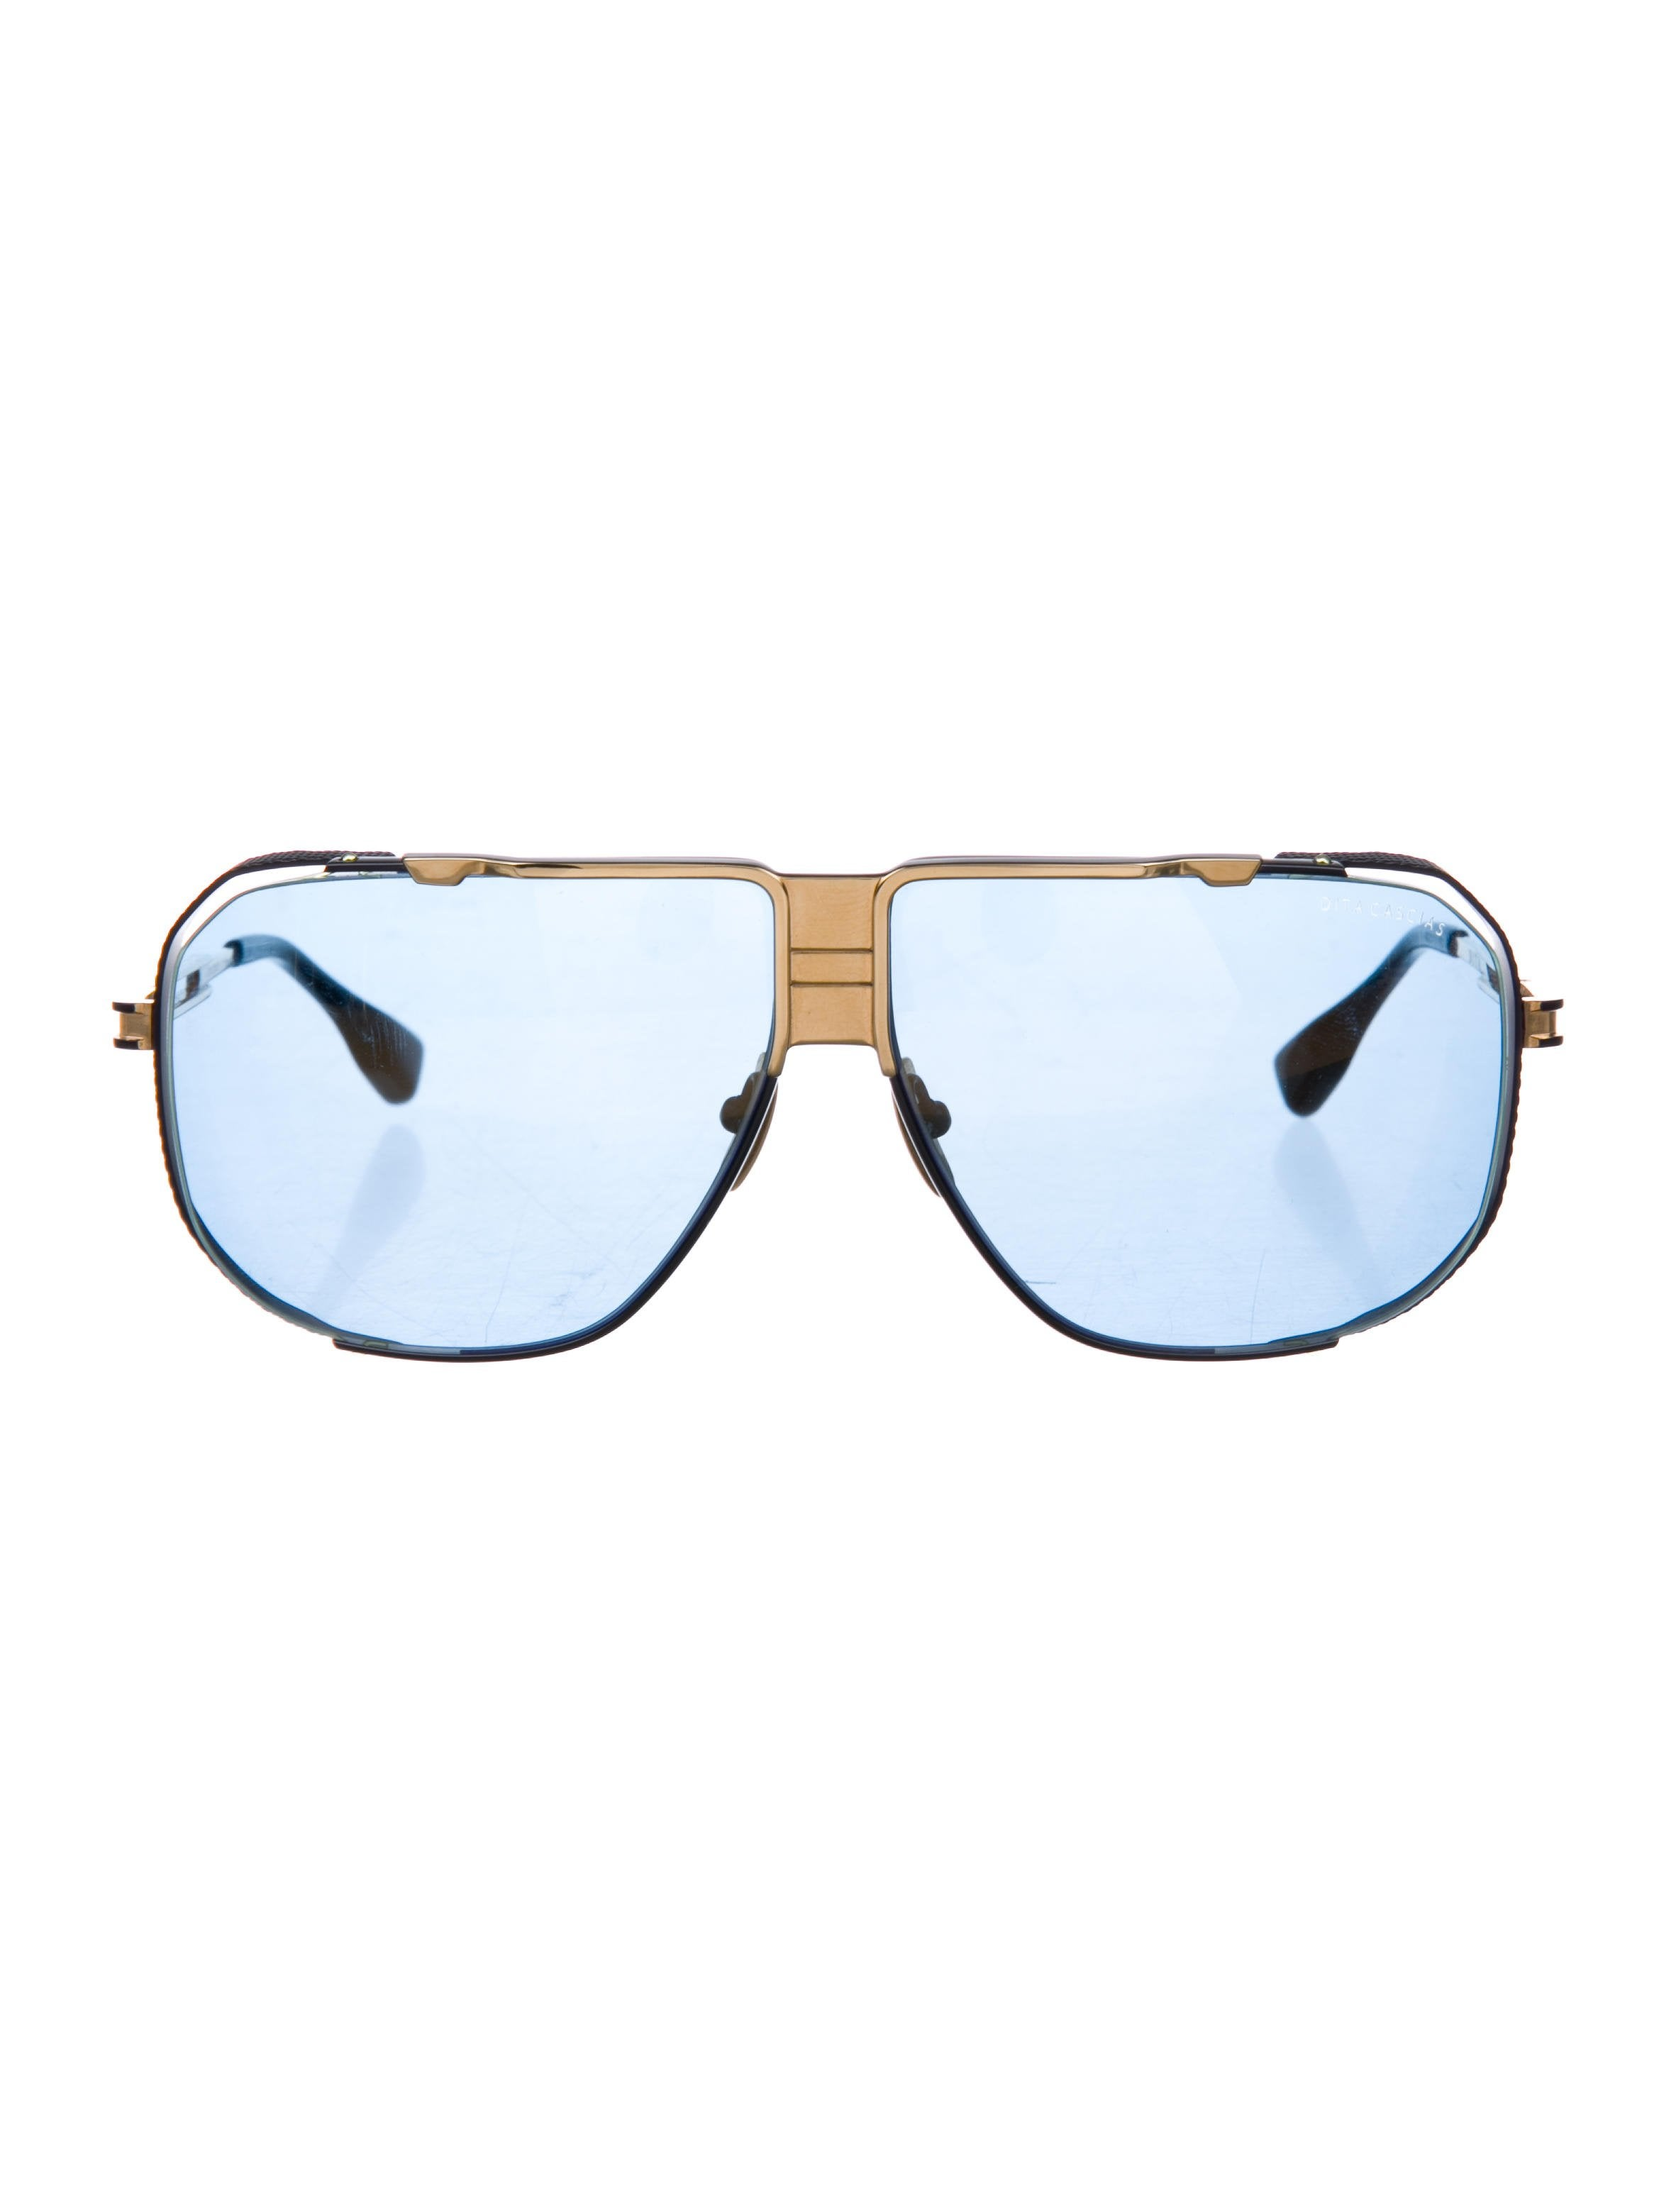 5de4e8ace8cf Dita Cascais 18k Sunglasses - Accessories - WDT21196